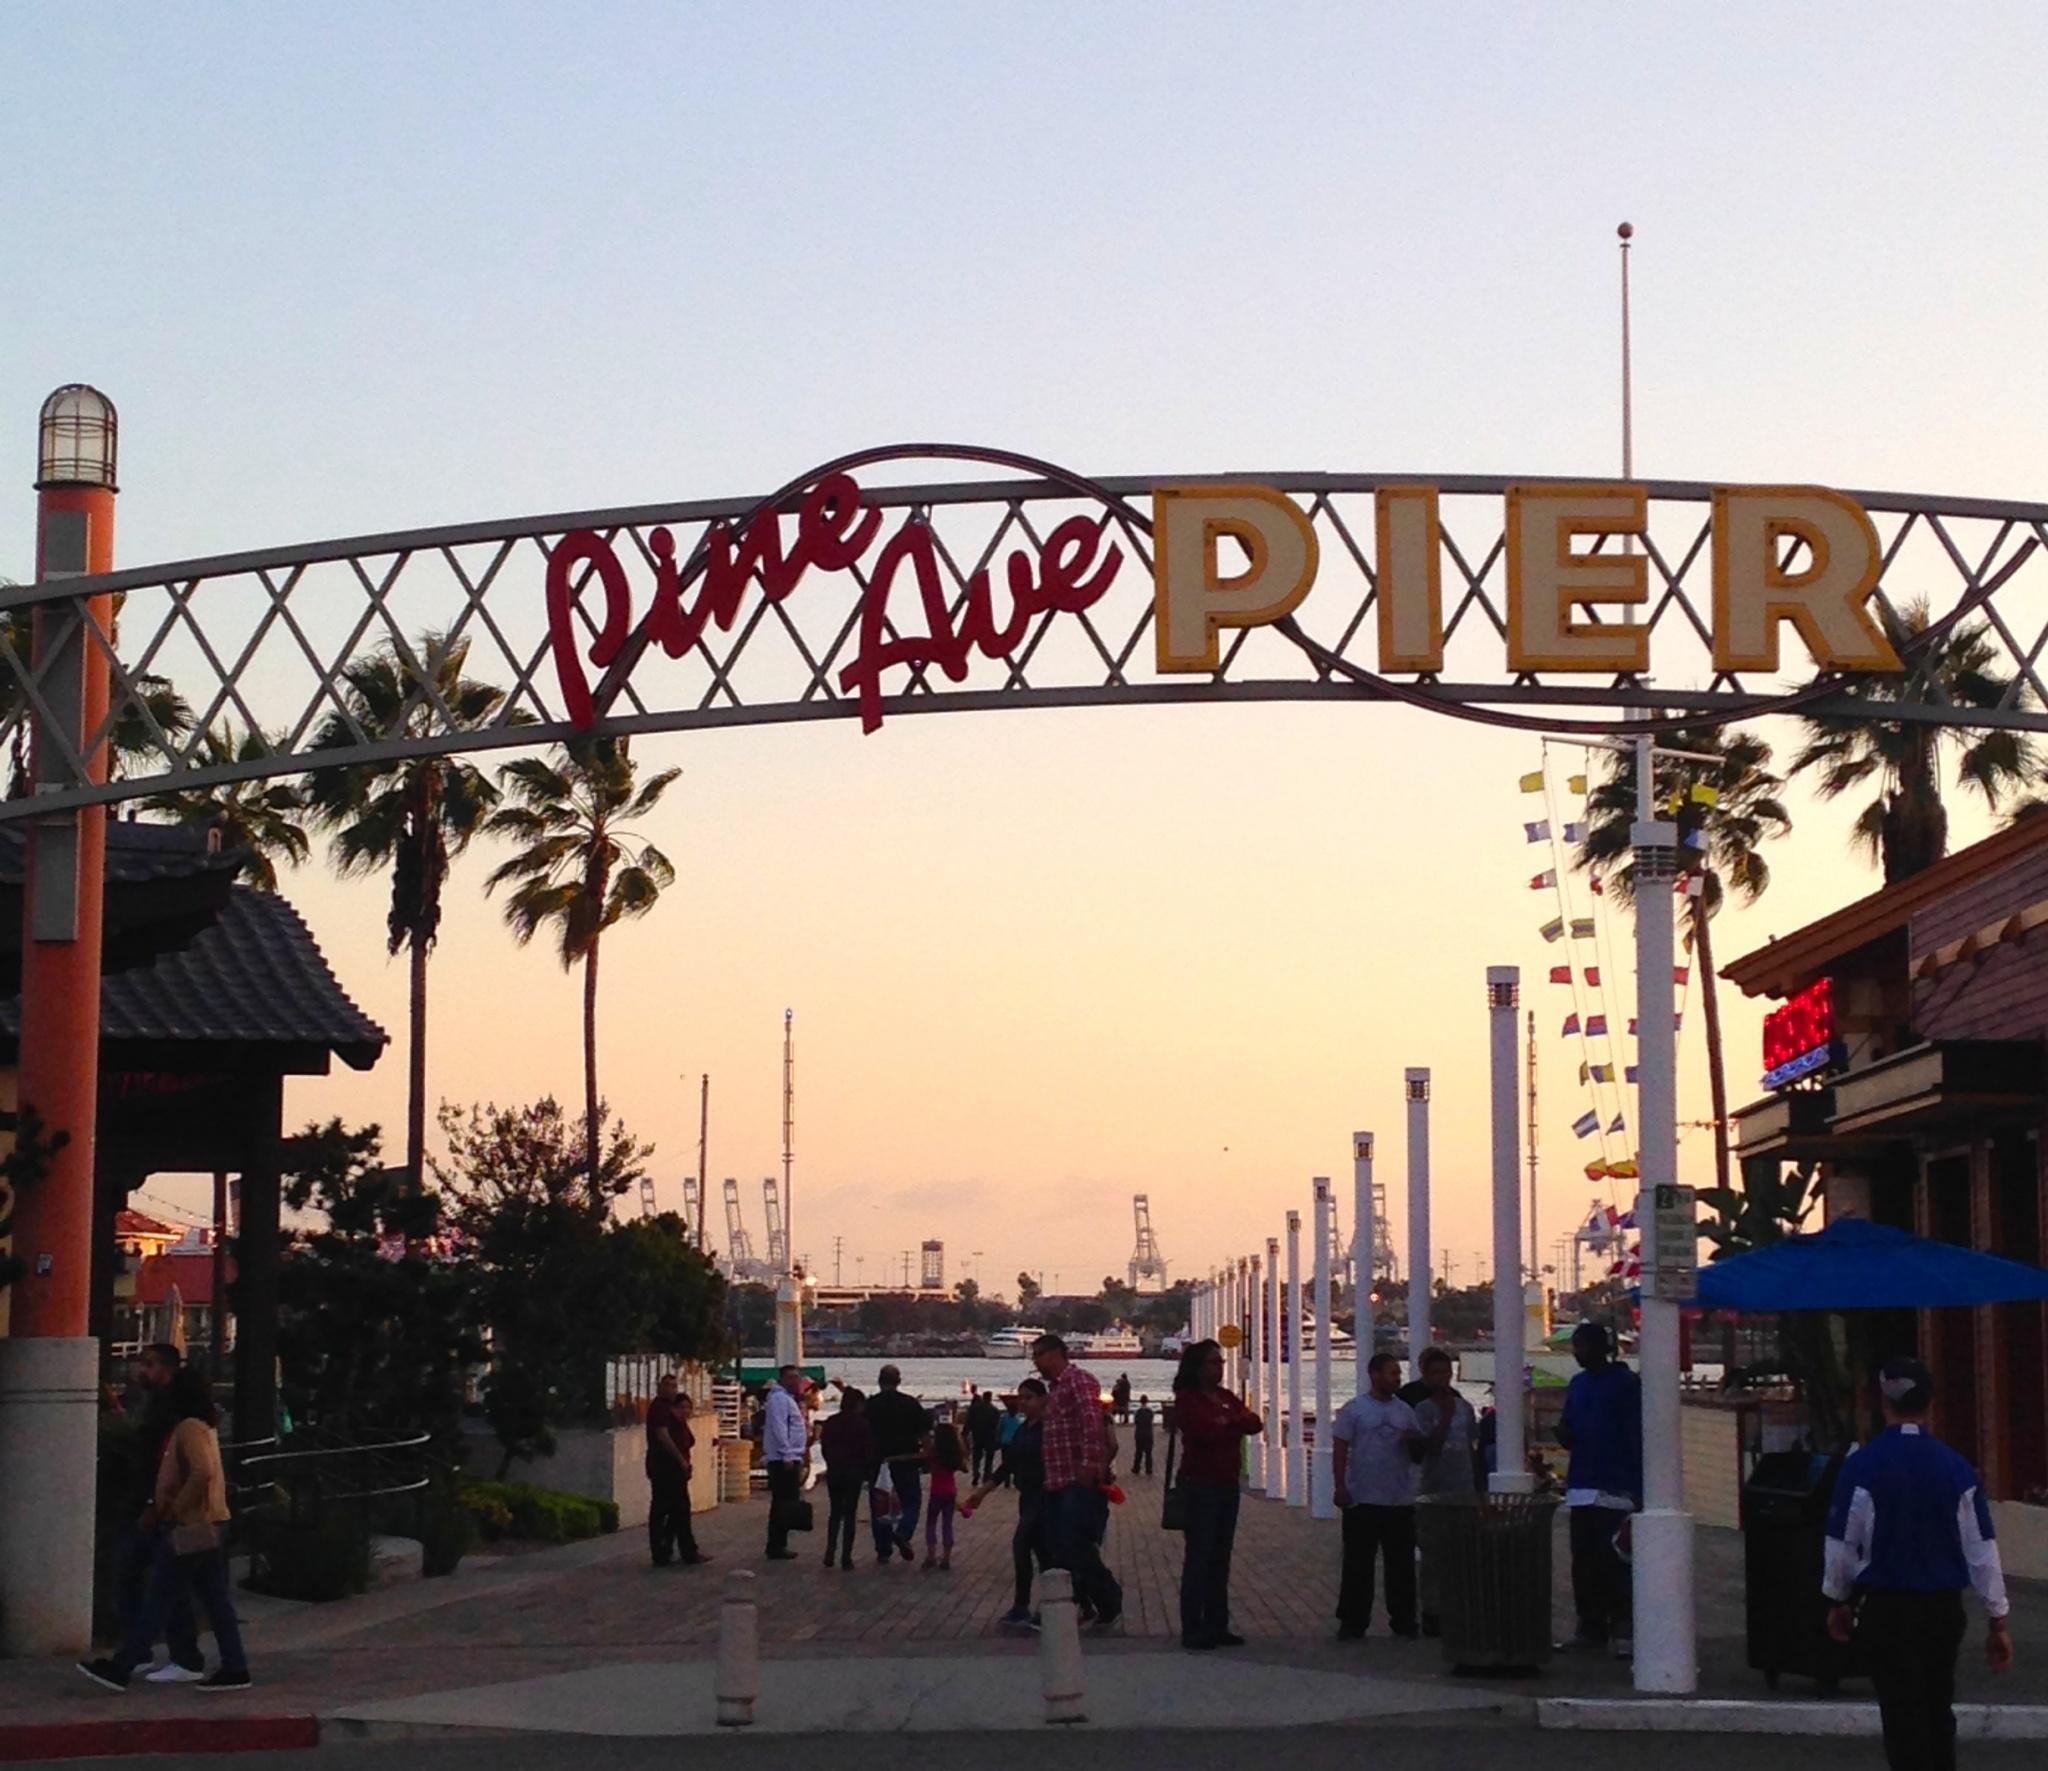 Pine Ave Pier Long Beach California